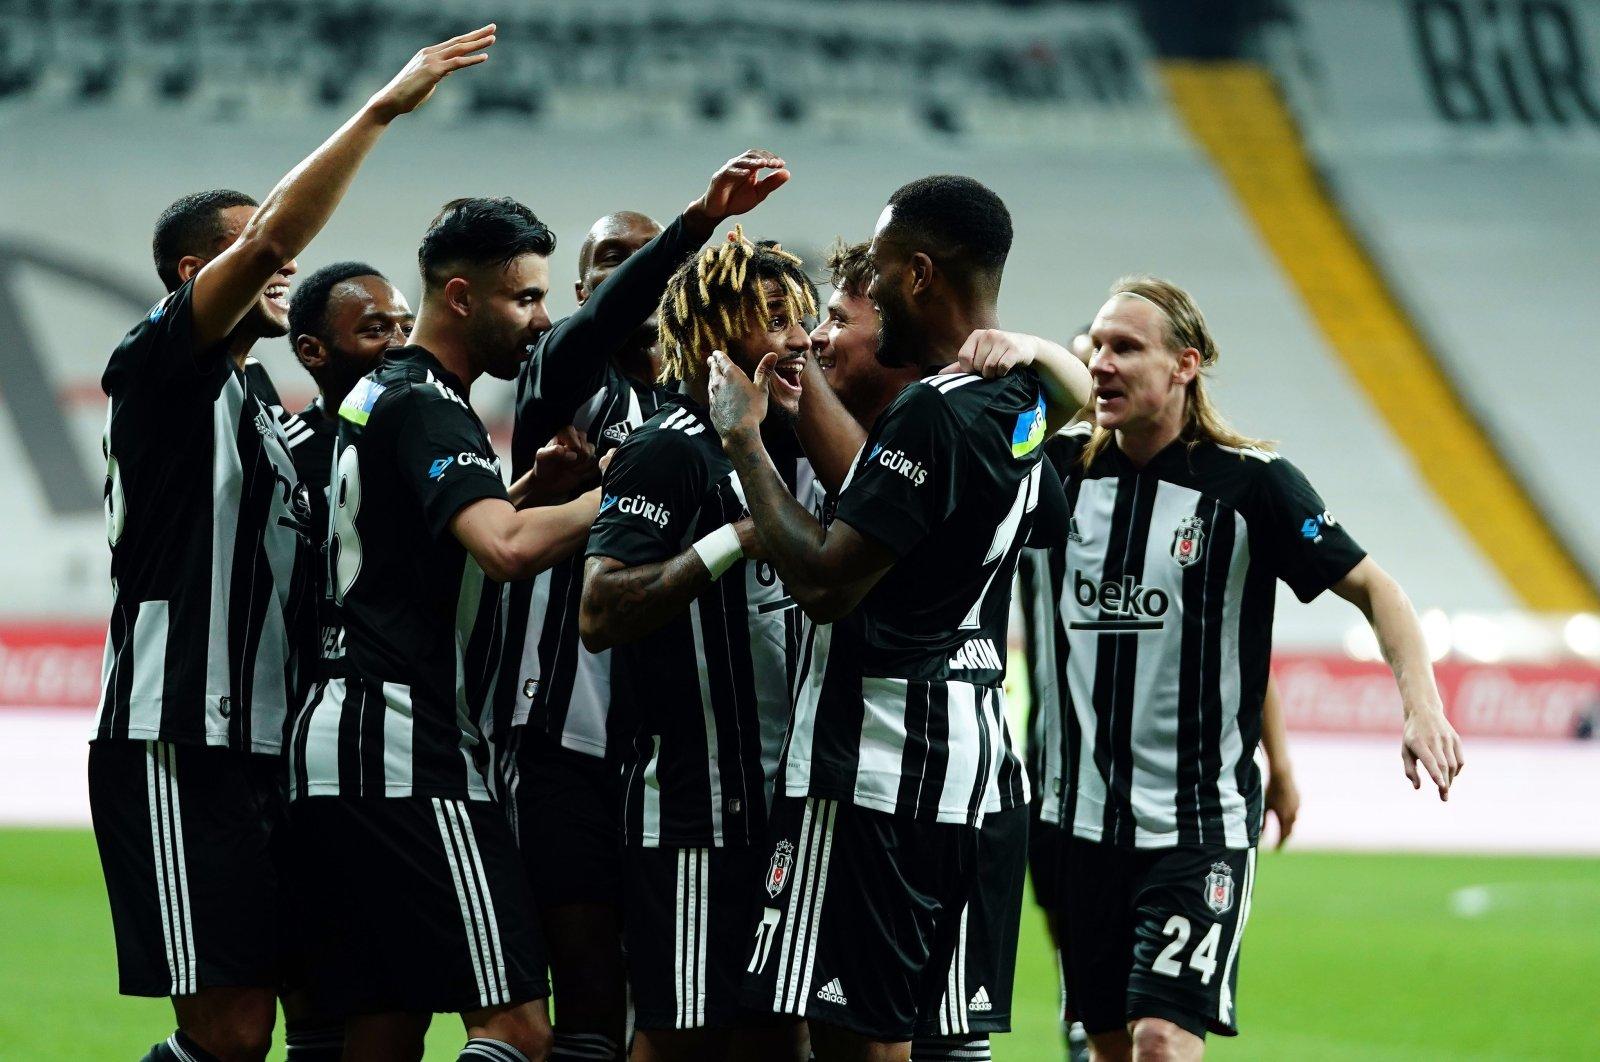 Beşiktaş players celebrate a goal against Hatayspor during a Turkish Süper Lig match in Istanbul, Turkey, May 2, 2021. (IHA Photo)